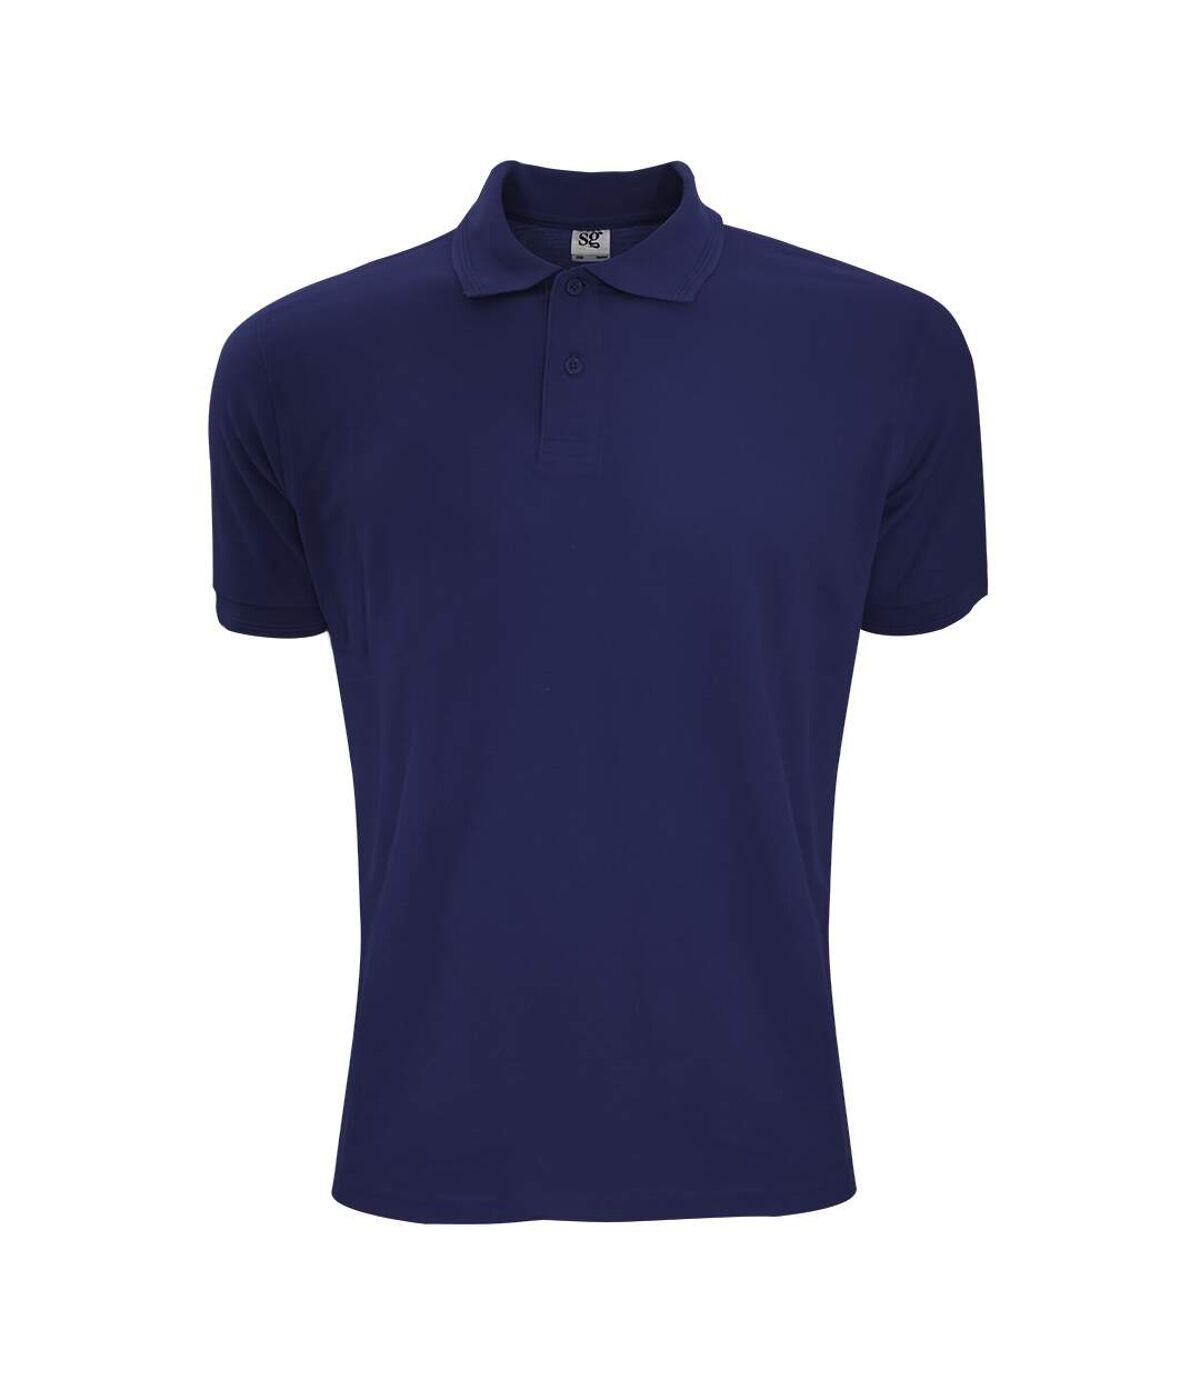 SG Mens Polycotton Short Sleeve Polo Shirt (Navy Blue) - UTBC1084